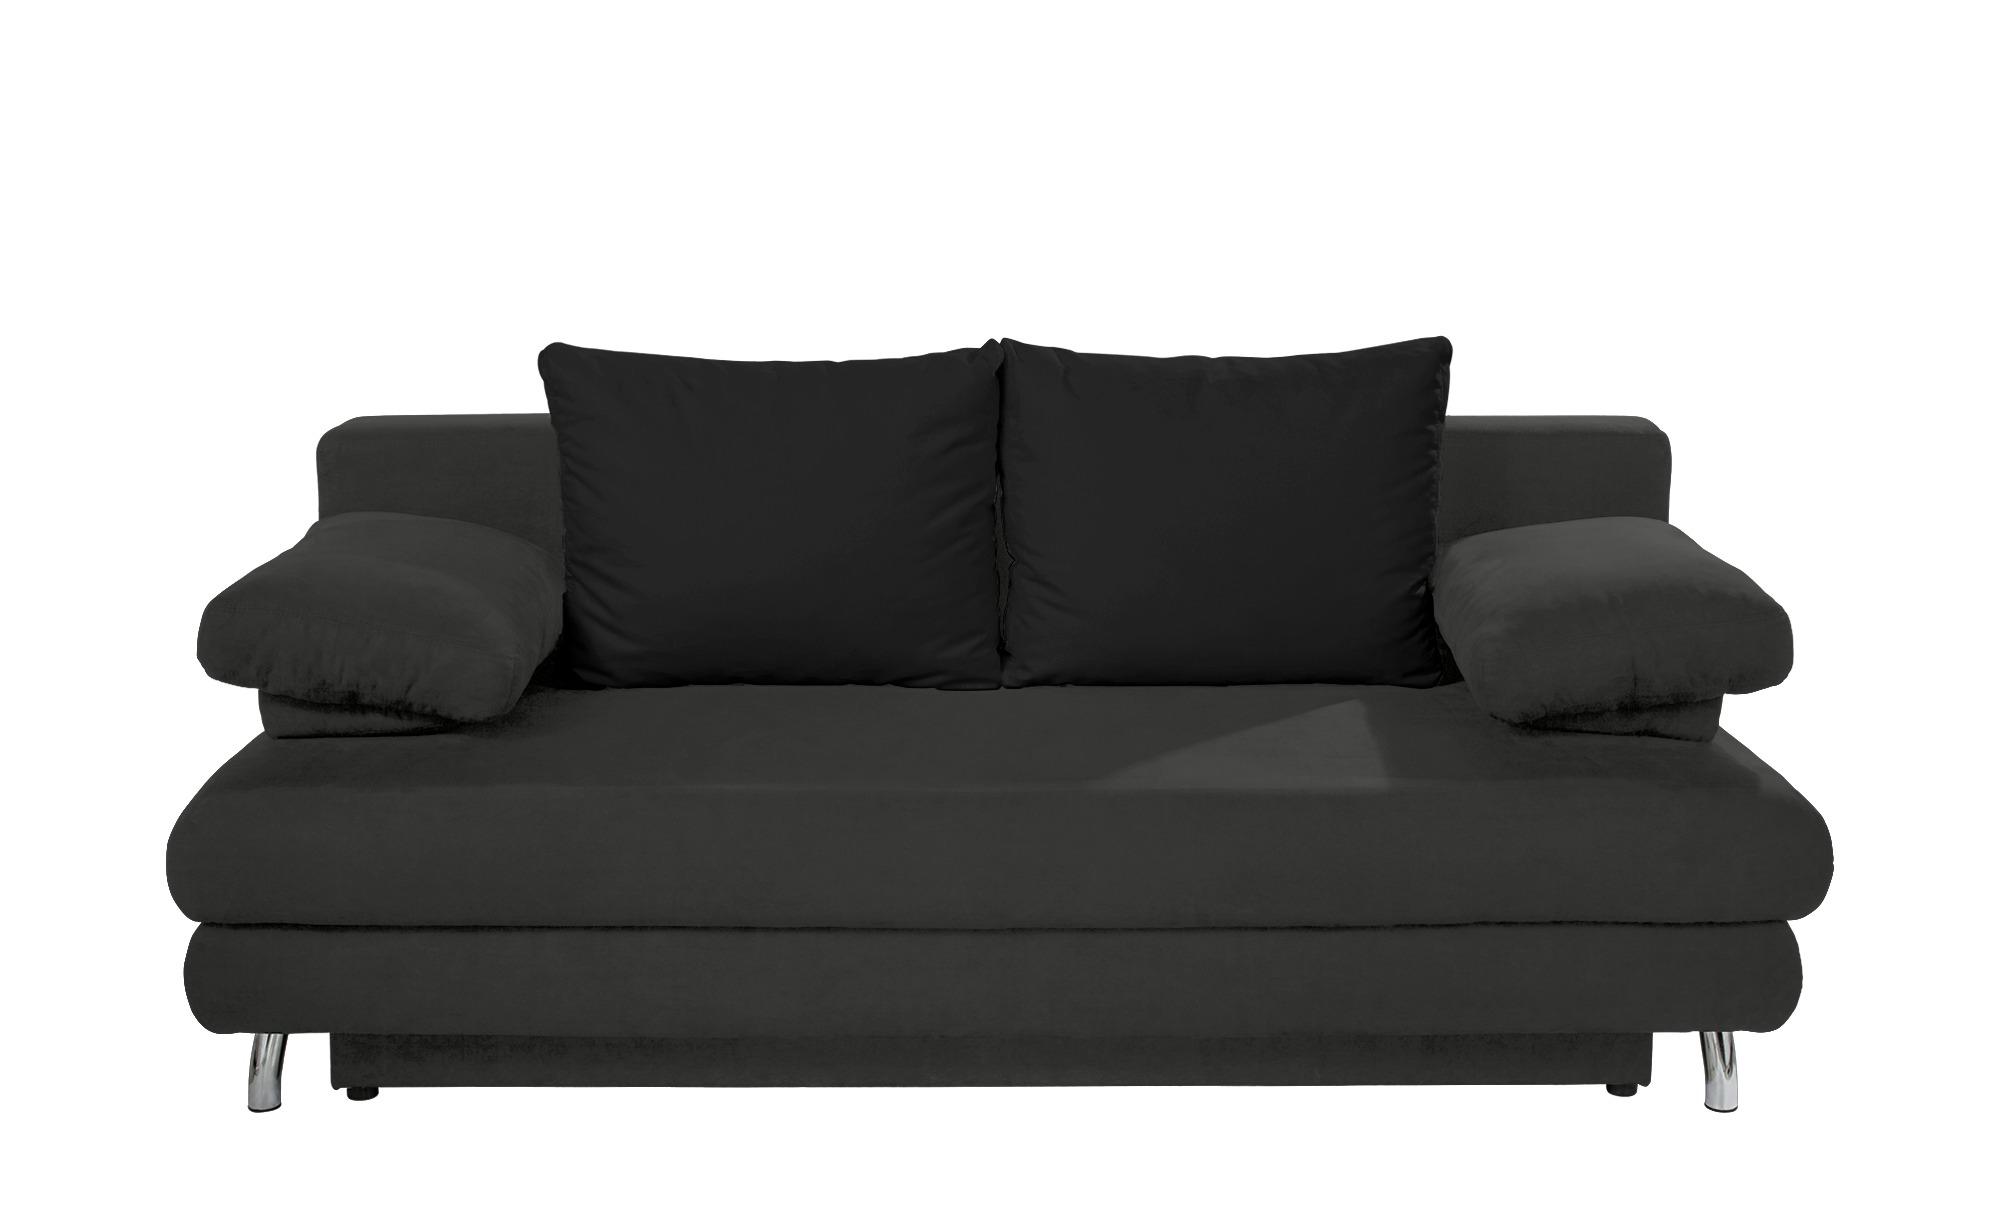 schlafsofa calina breite 205 cm h he 80 cm schwarz